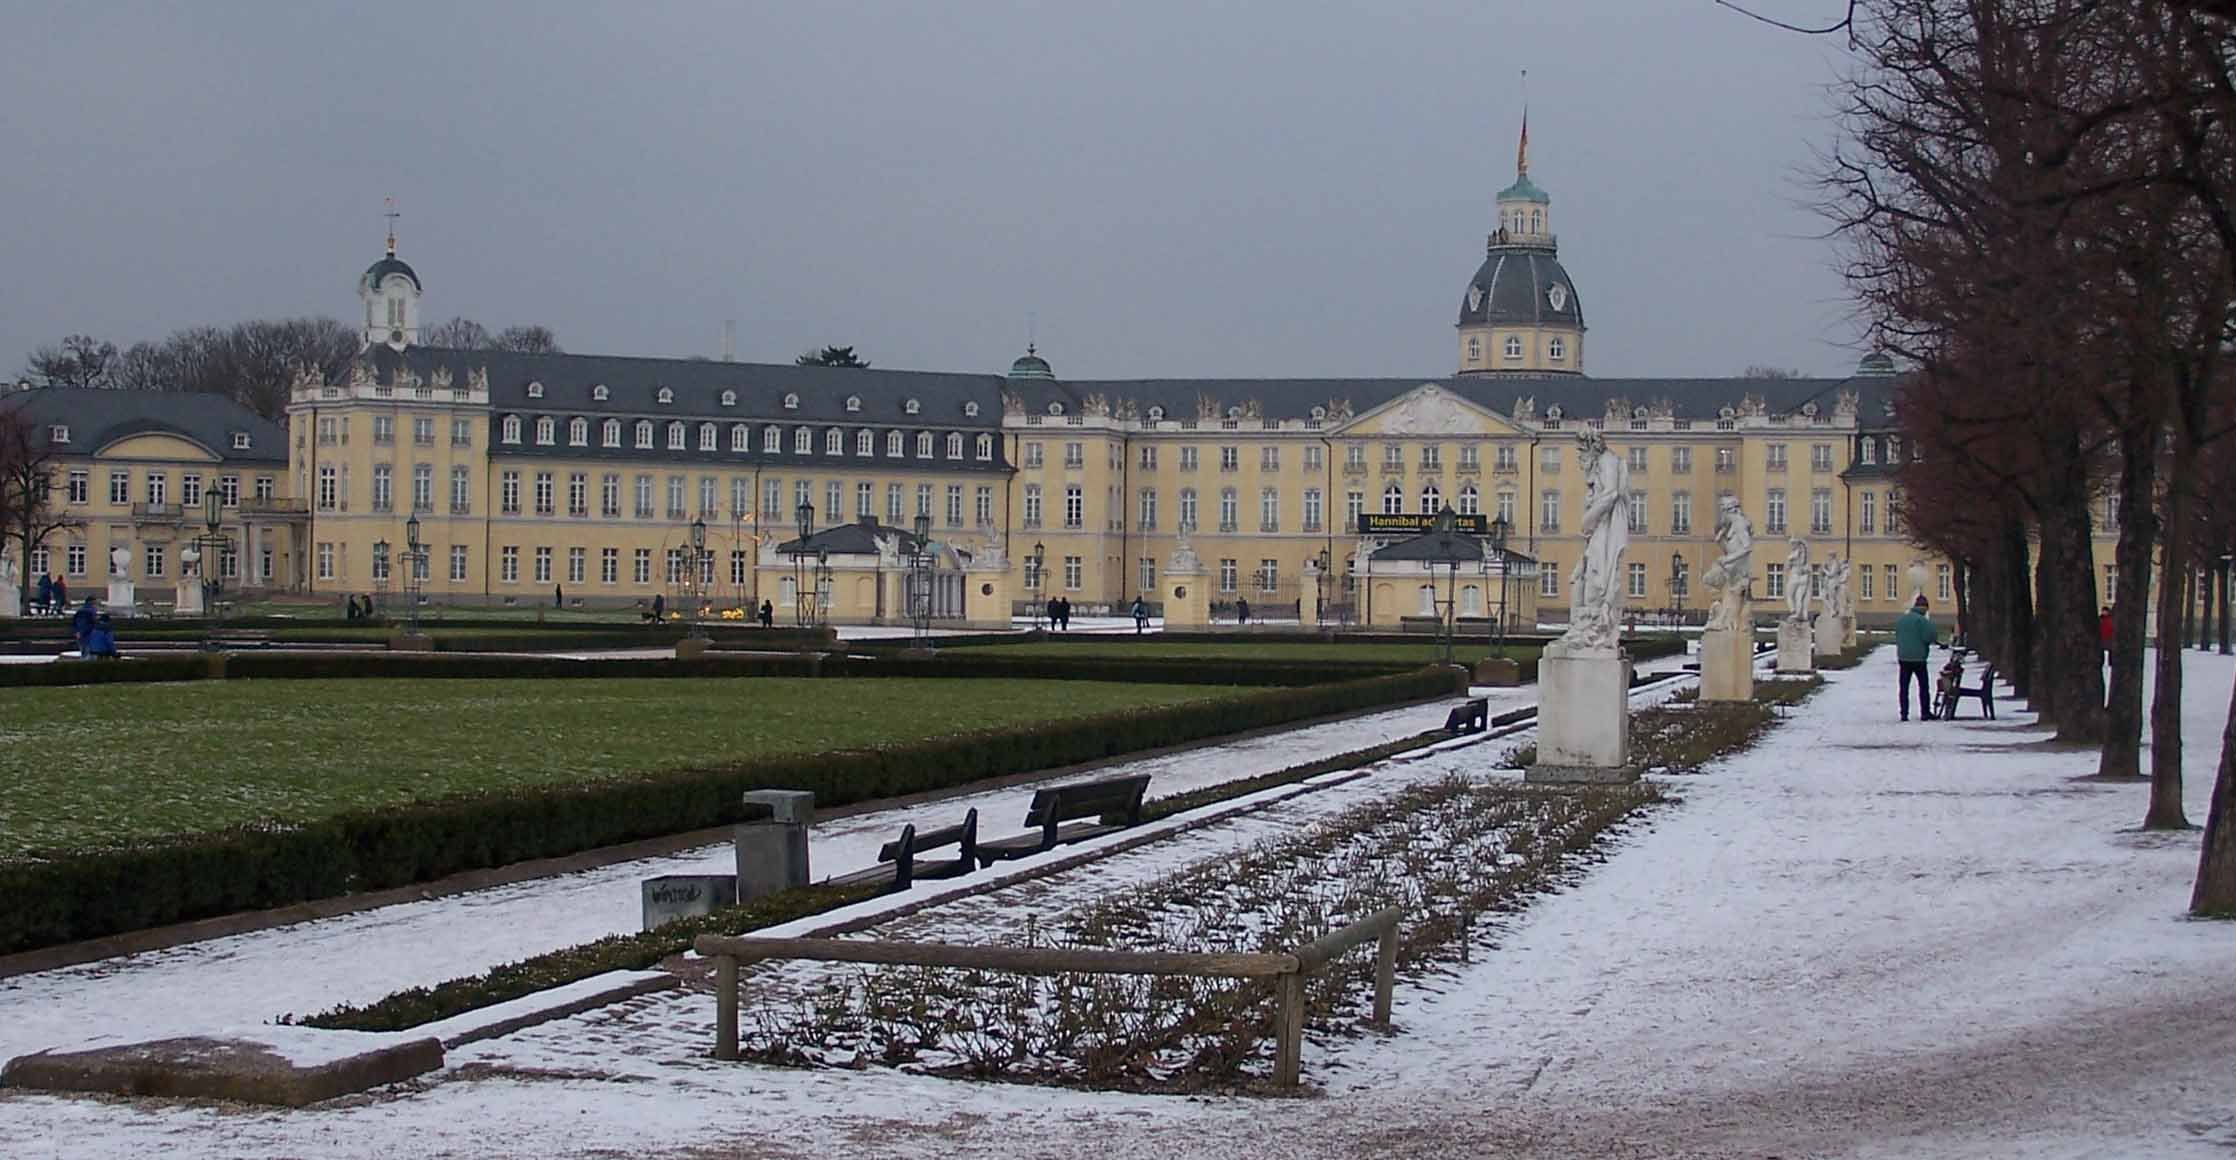 chateau de schloss karlsruhe